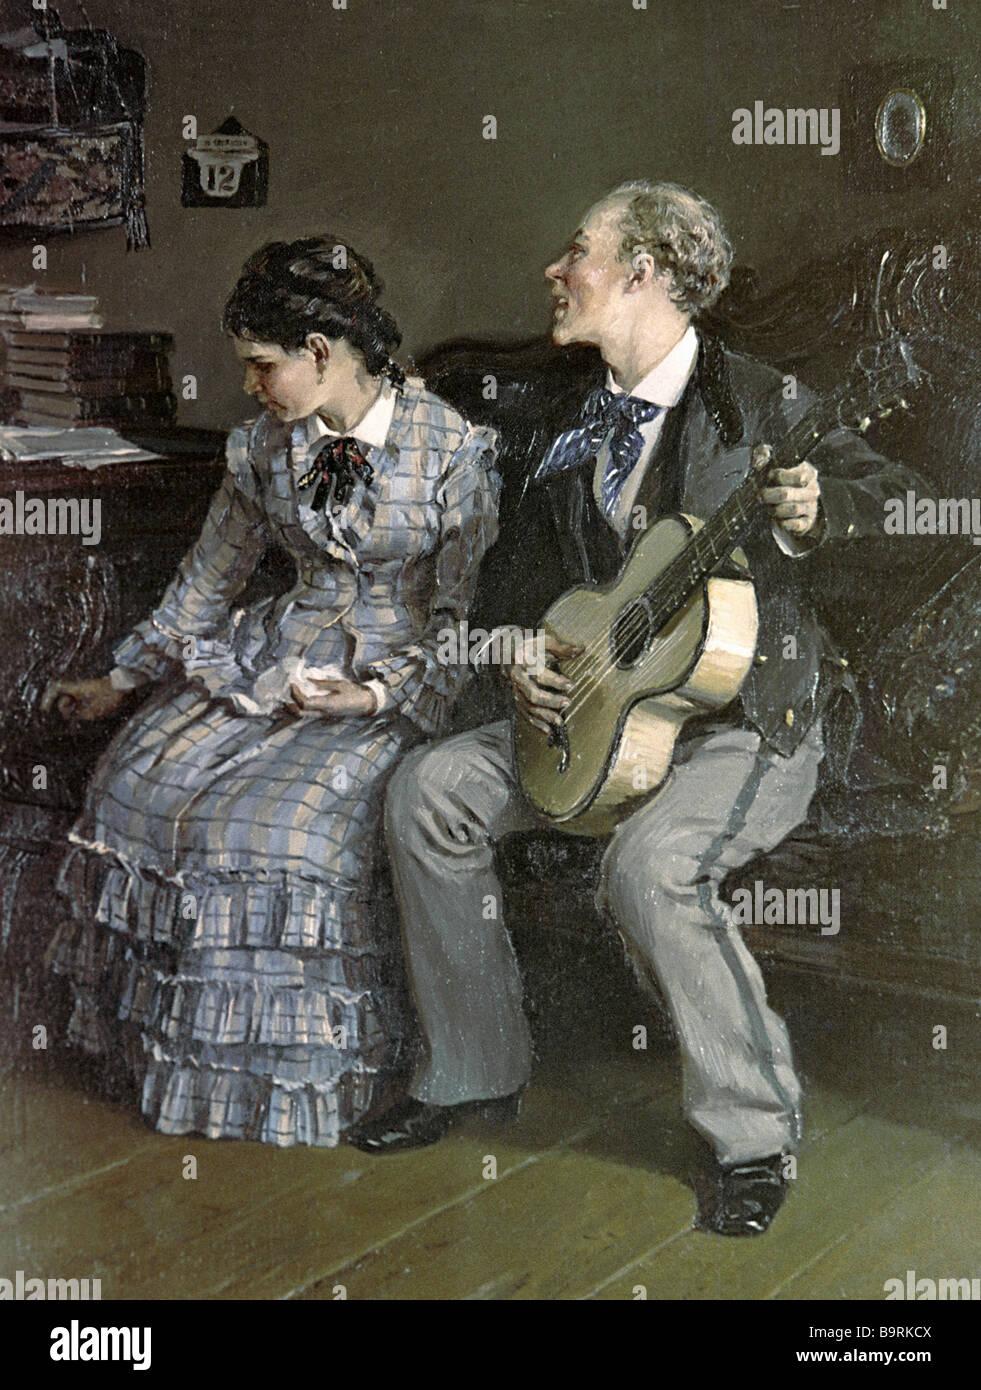 Illarion Pryanishnikov s peinture Romances cruelles de la collection de la Galerie Tretiakov Photo Stock